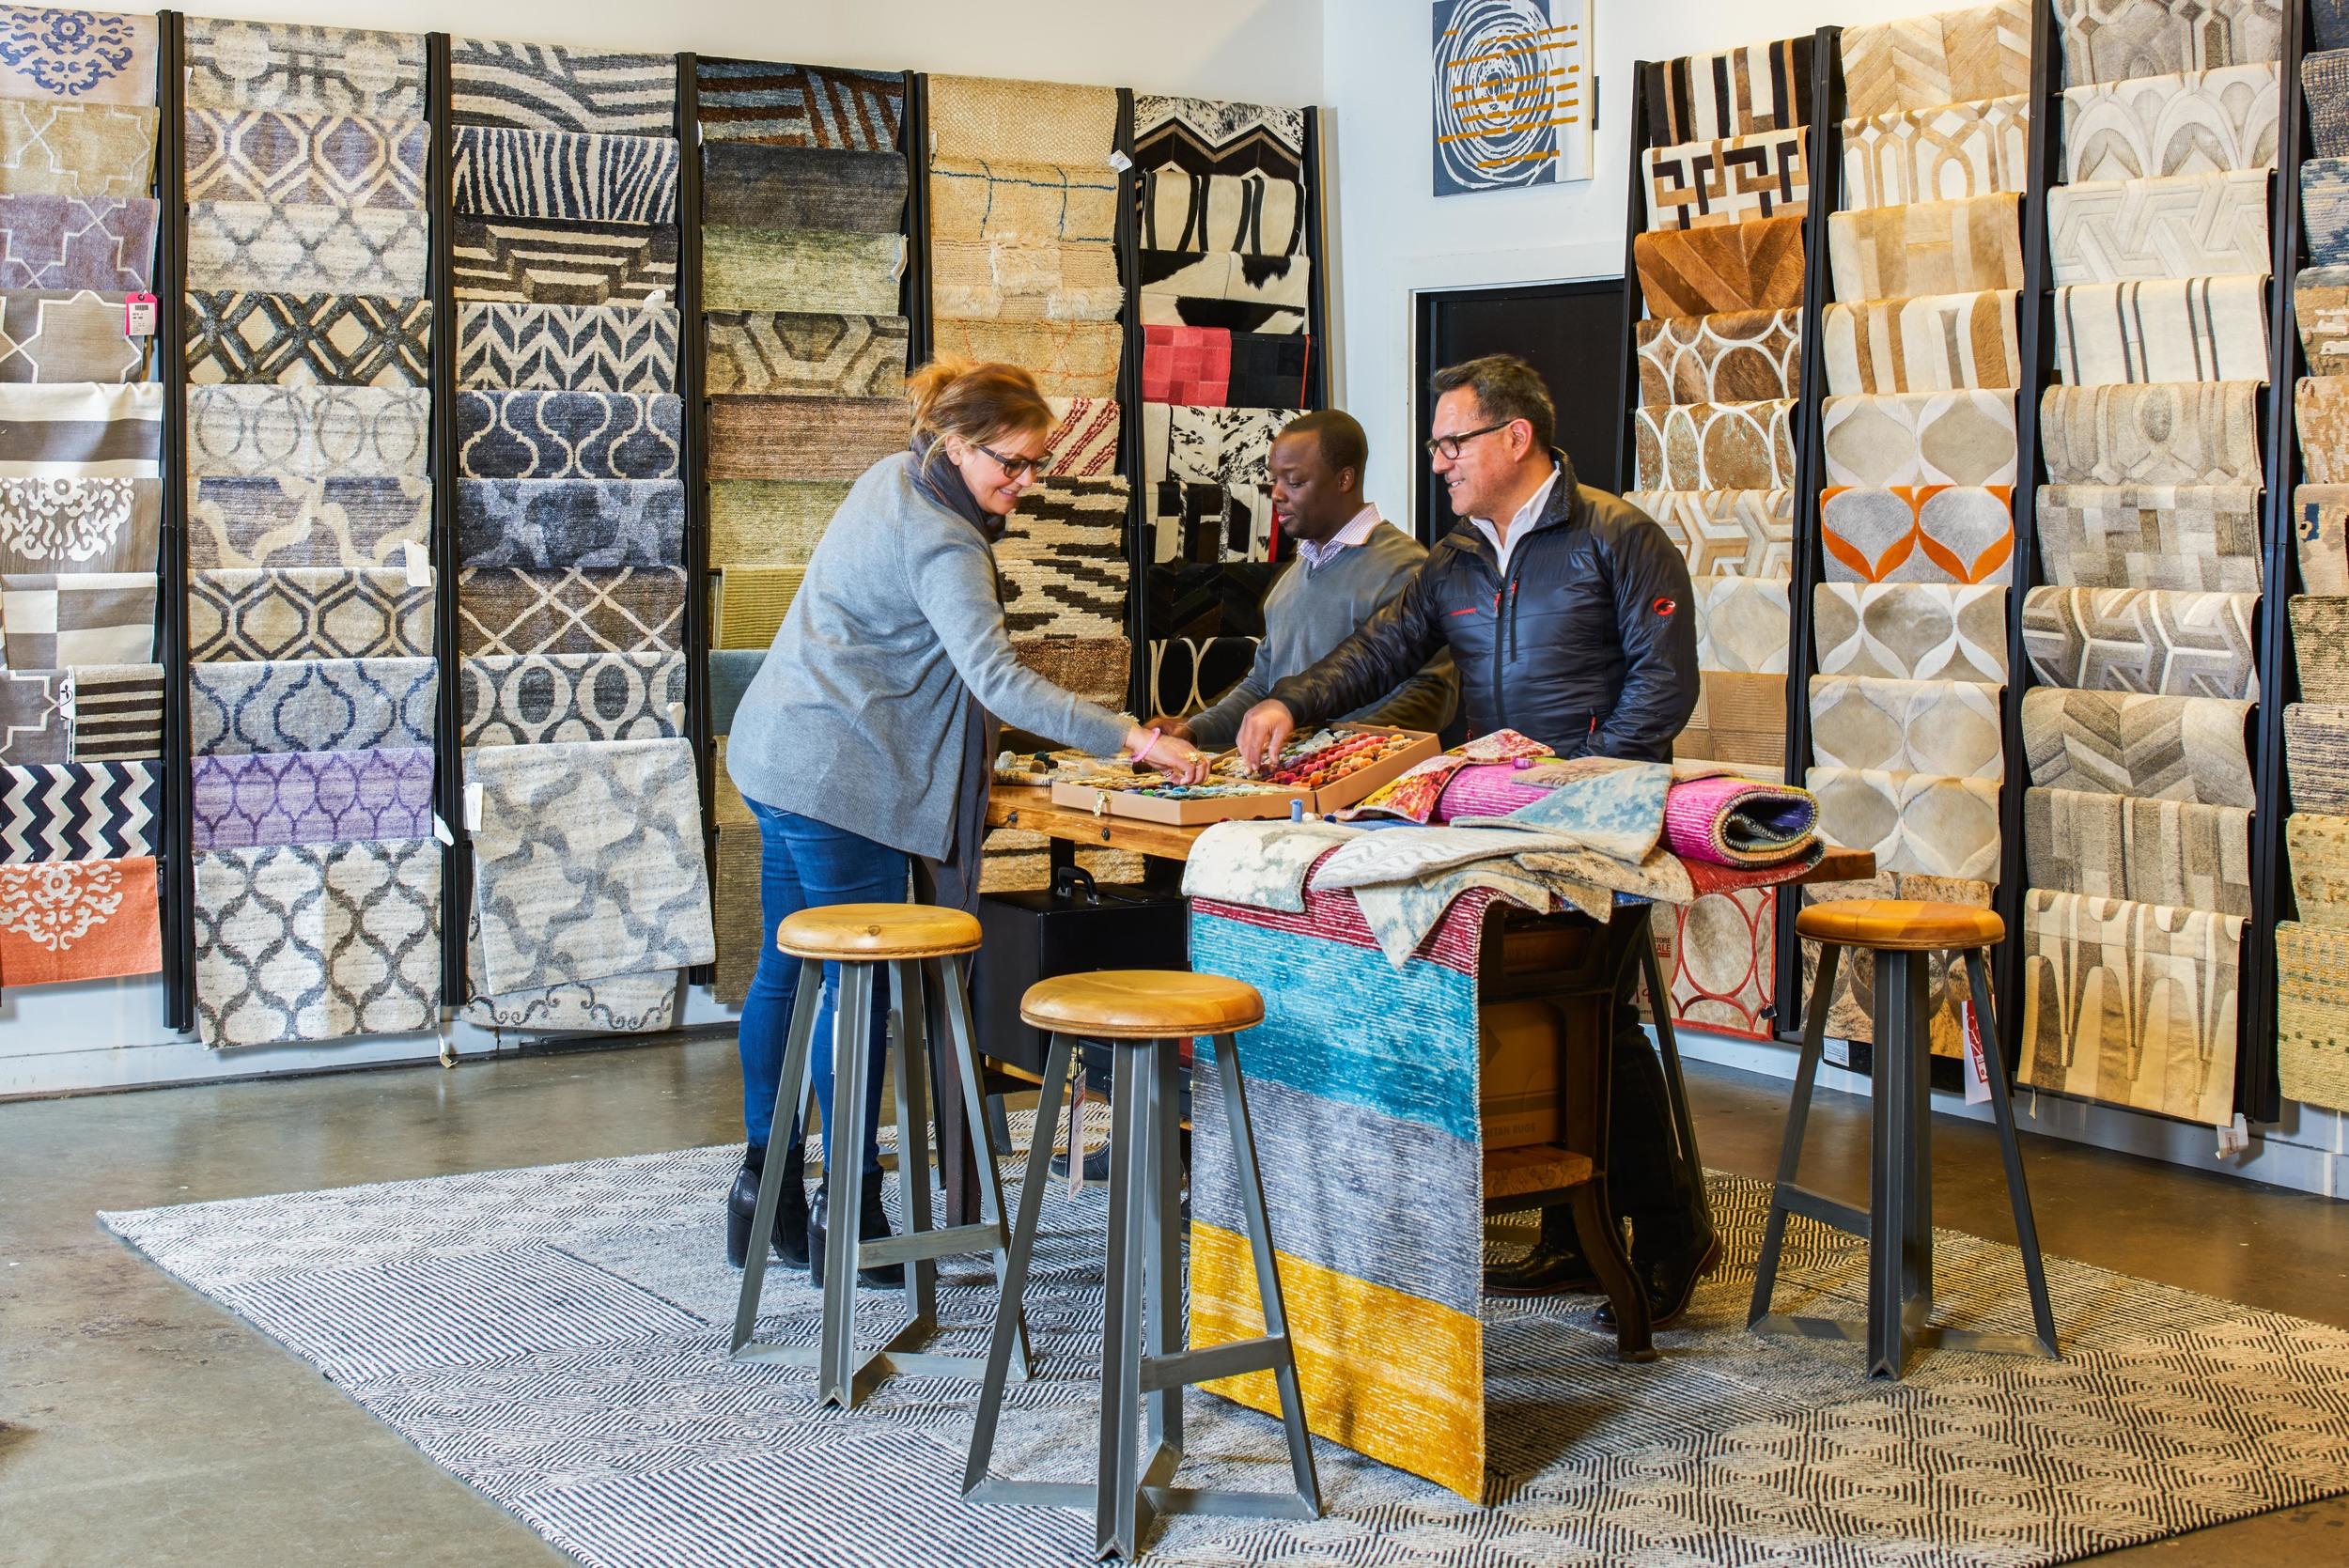 LA_Store_Interiors 450.jpg